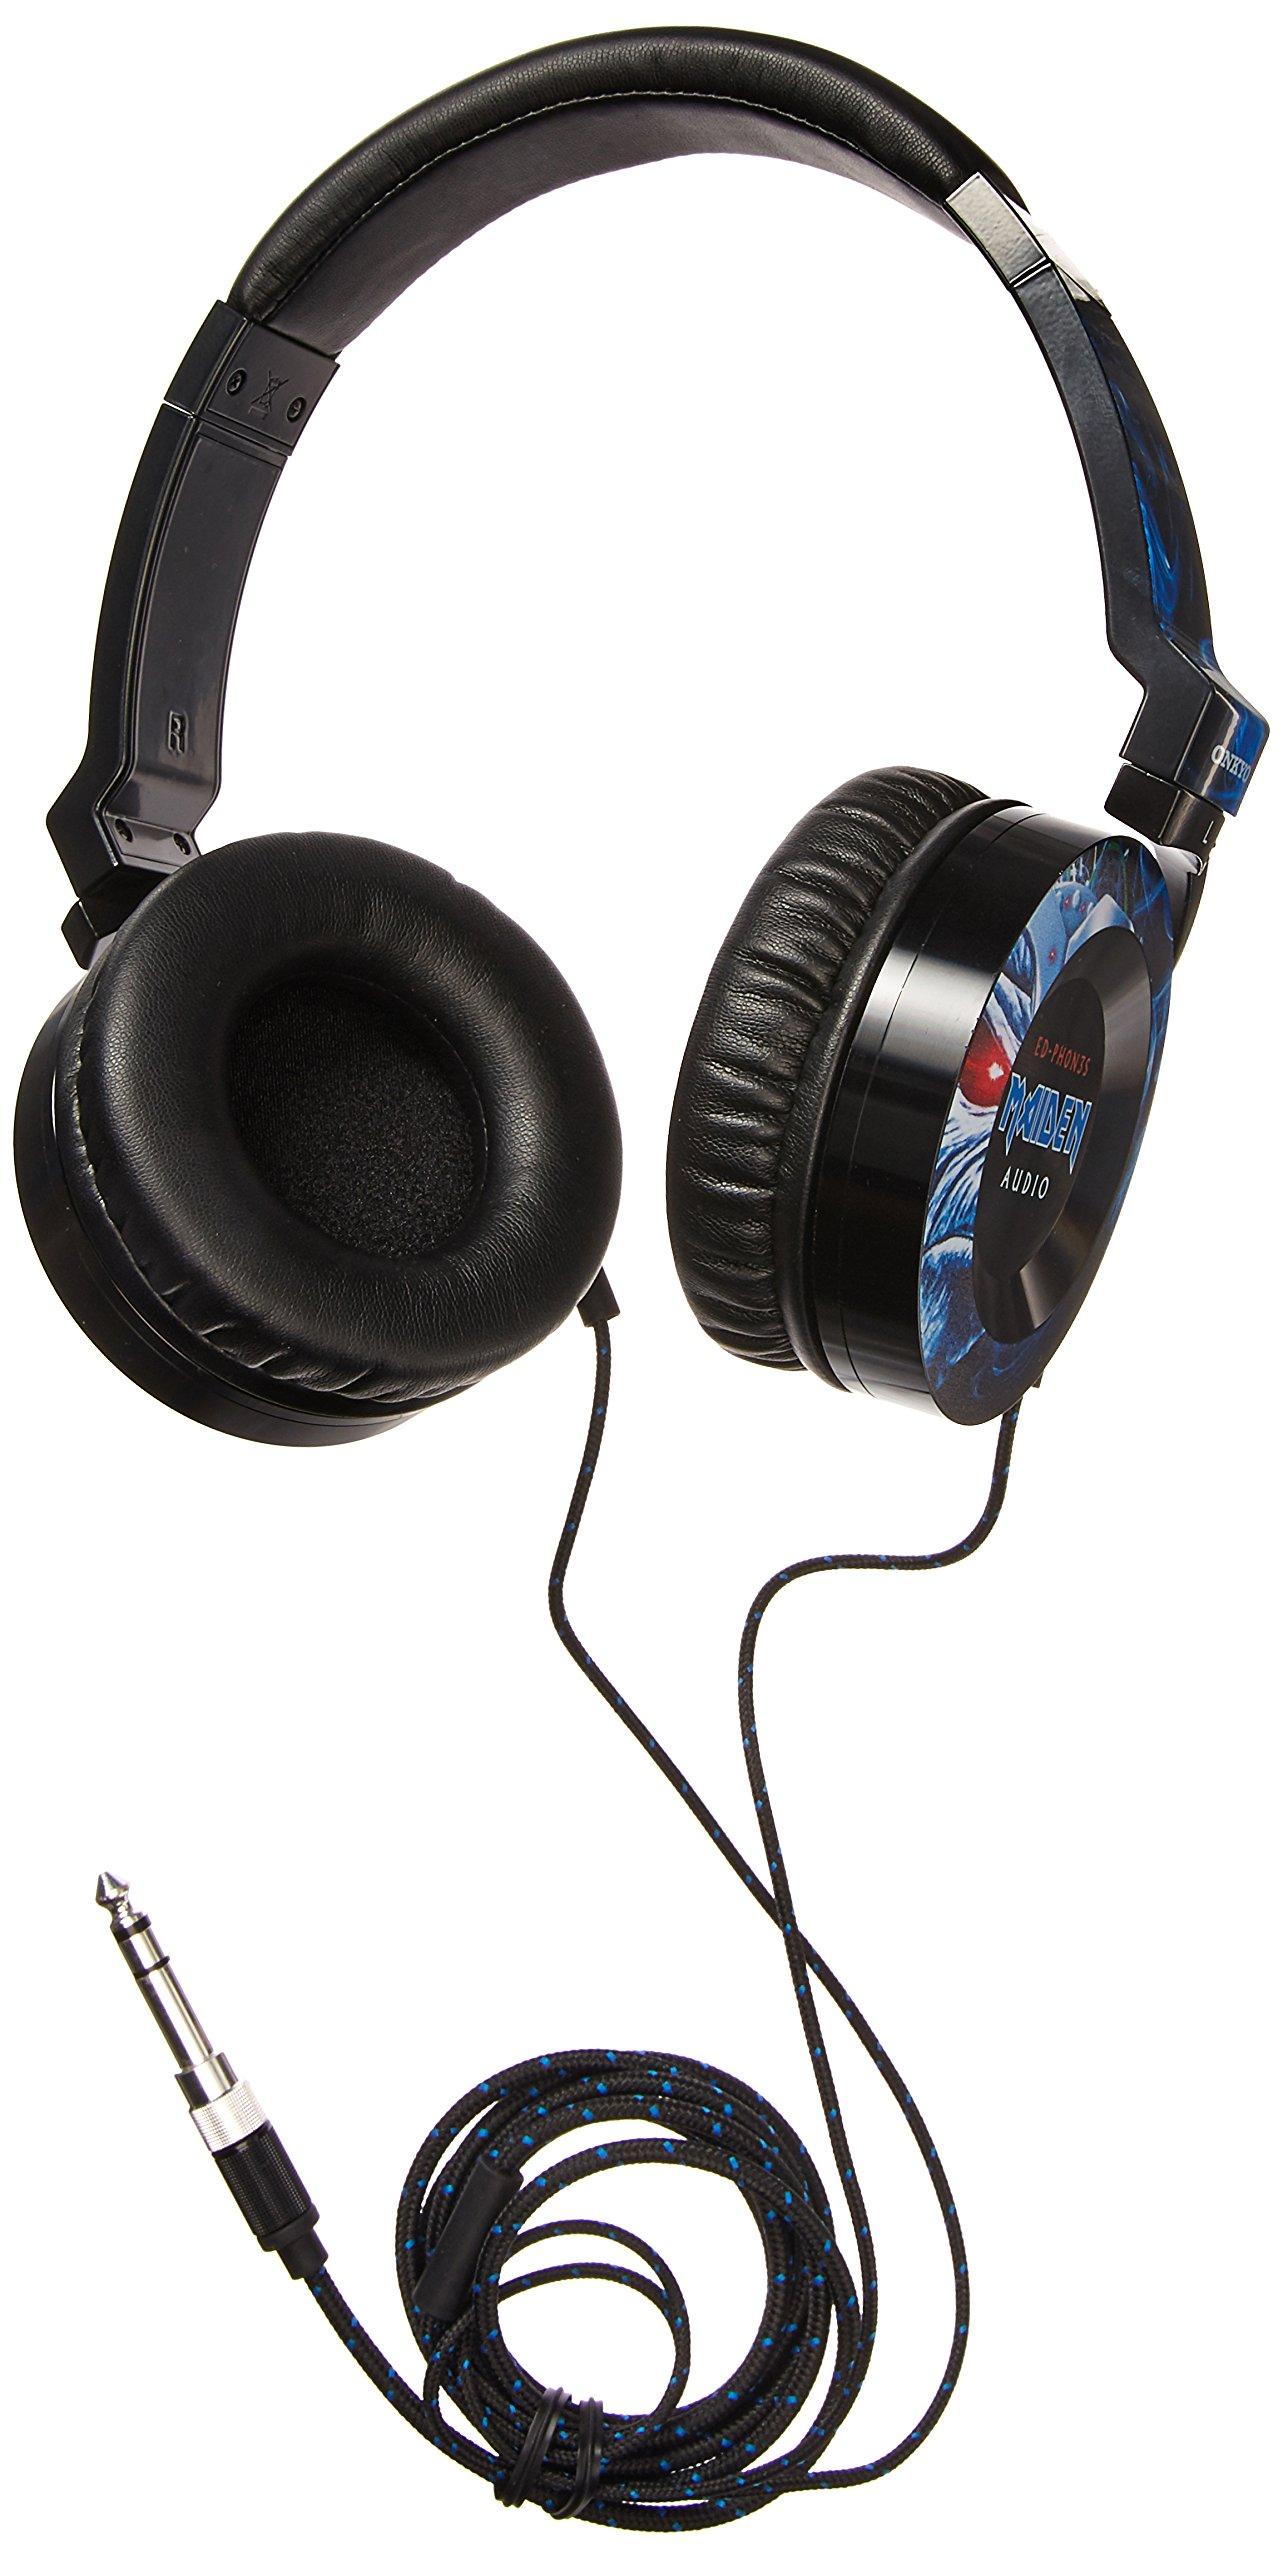 Onkyo Audio Headphones Wired Headset for Universal/Smartphones - Black